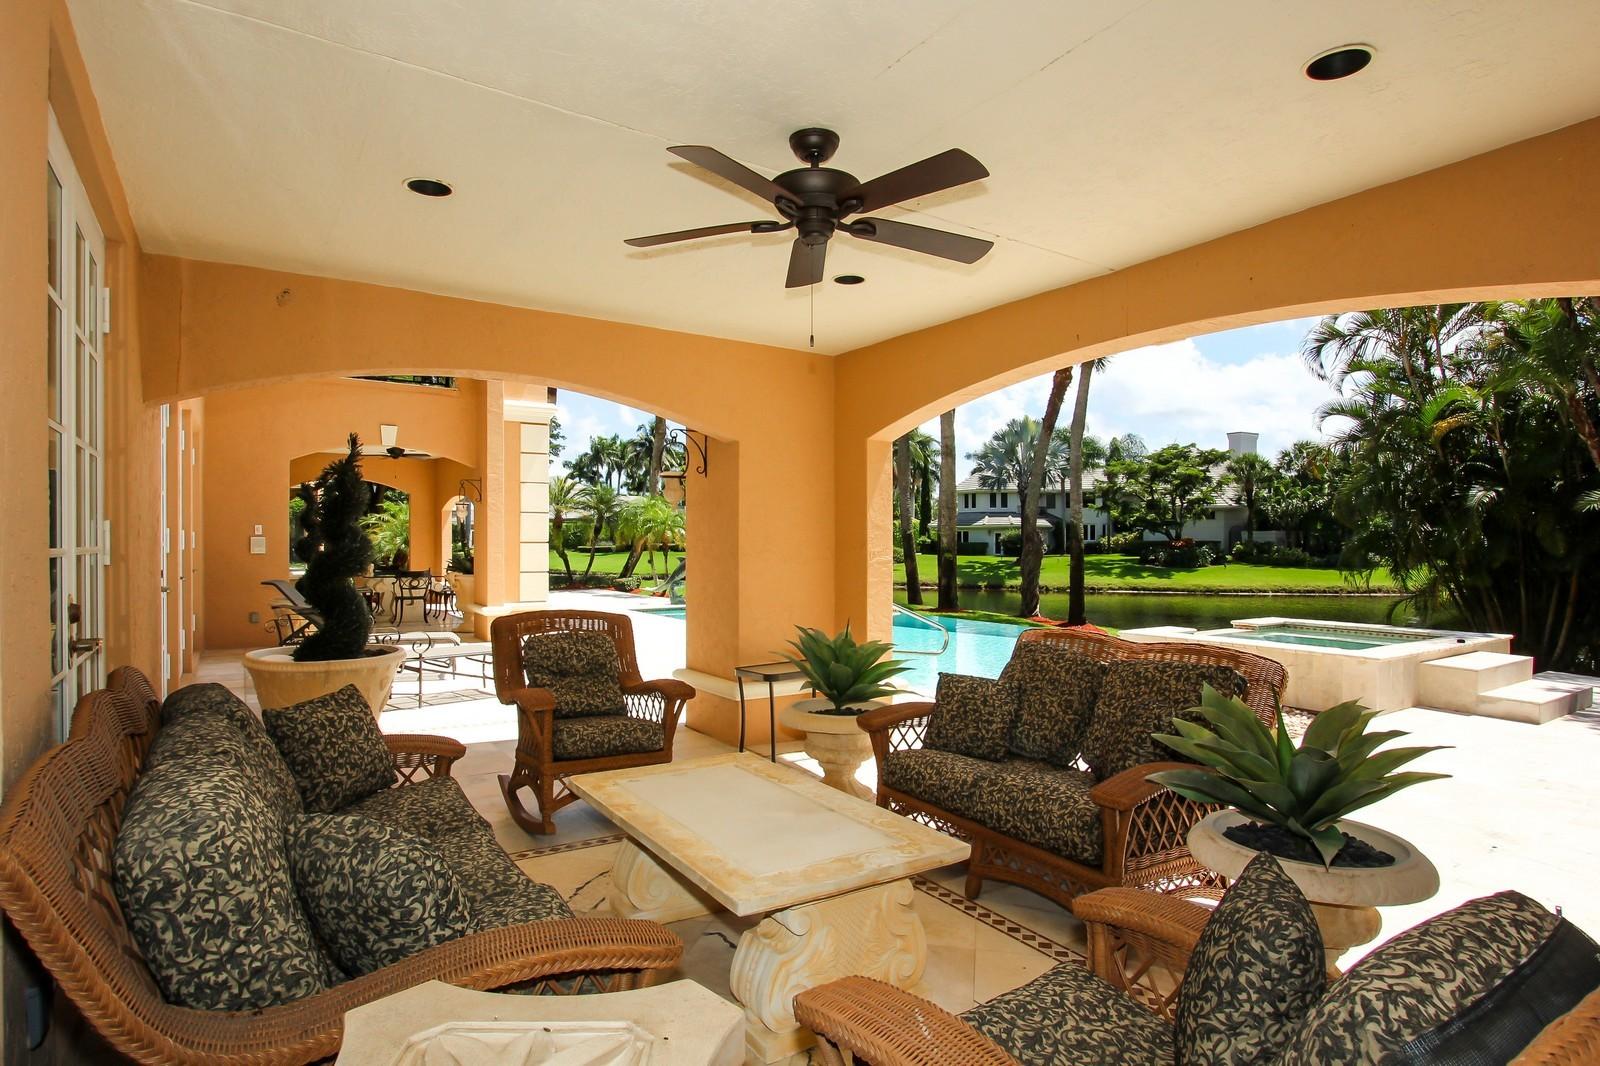 Real Estate Photography - 7015 Ayrshire Ln, Boca Raton, FL, 33496 - Location 2